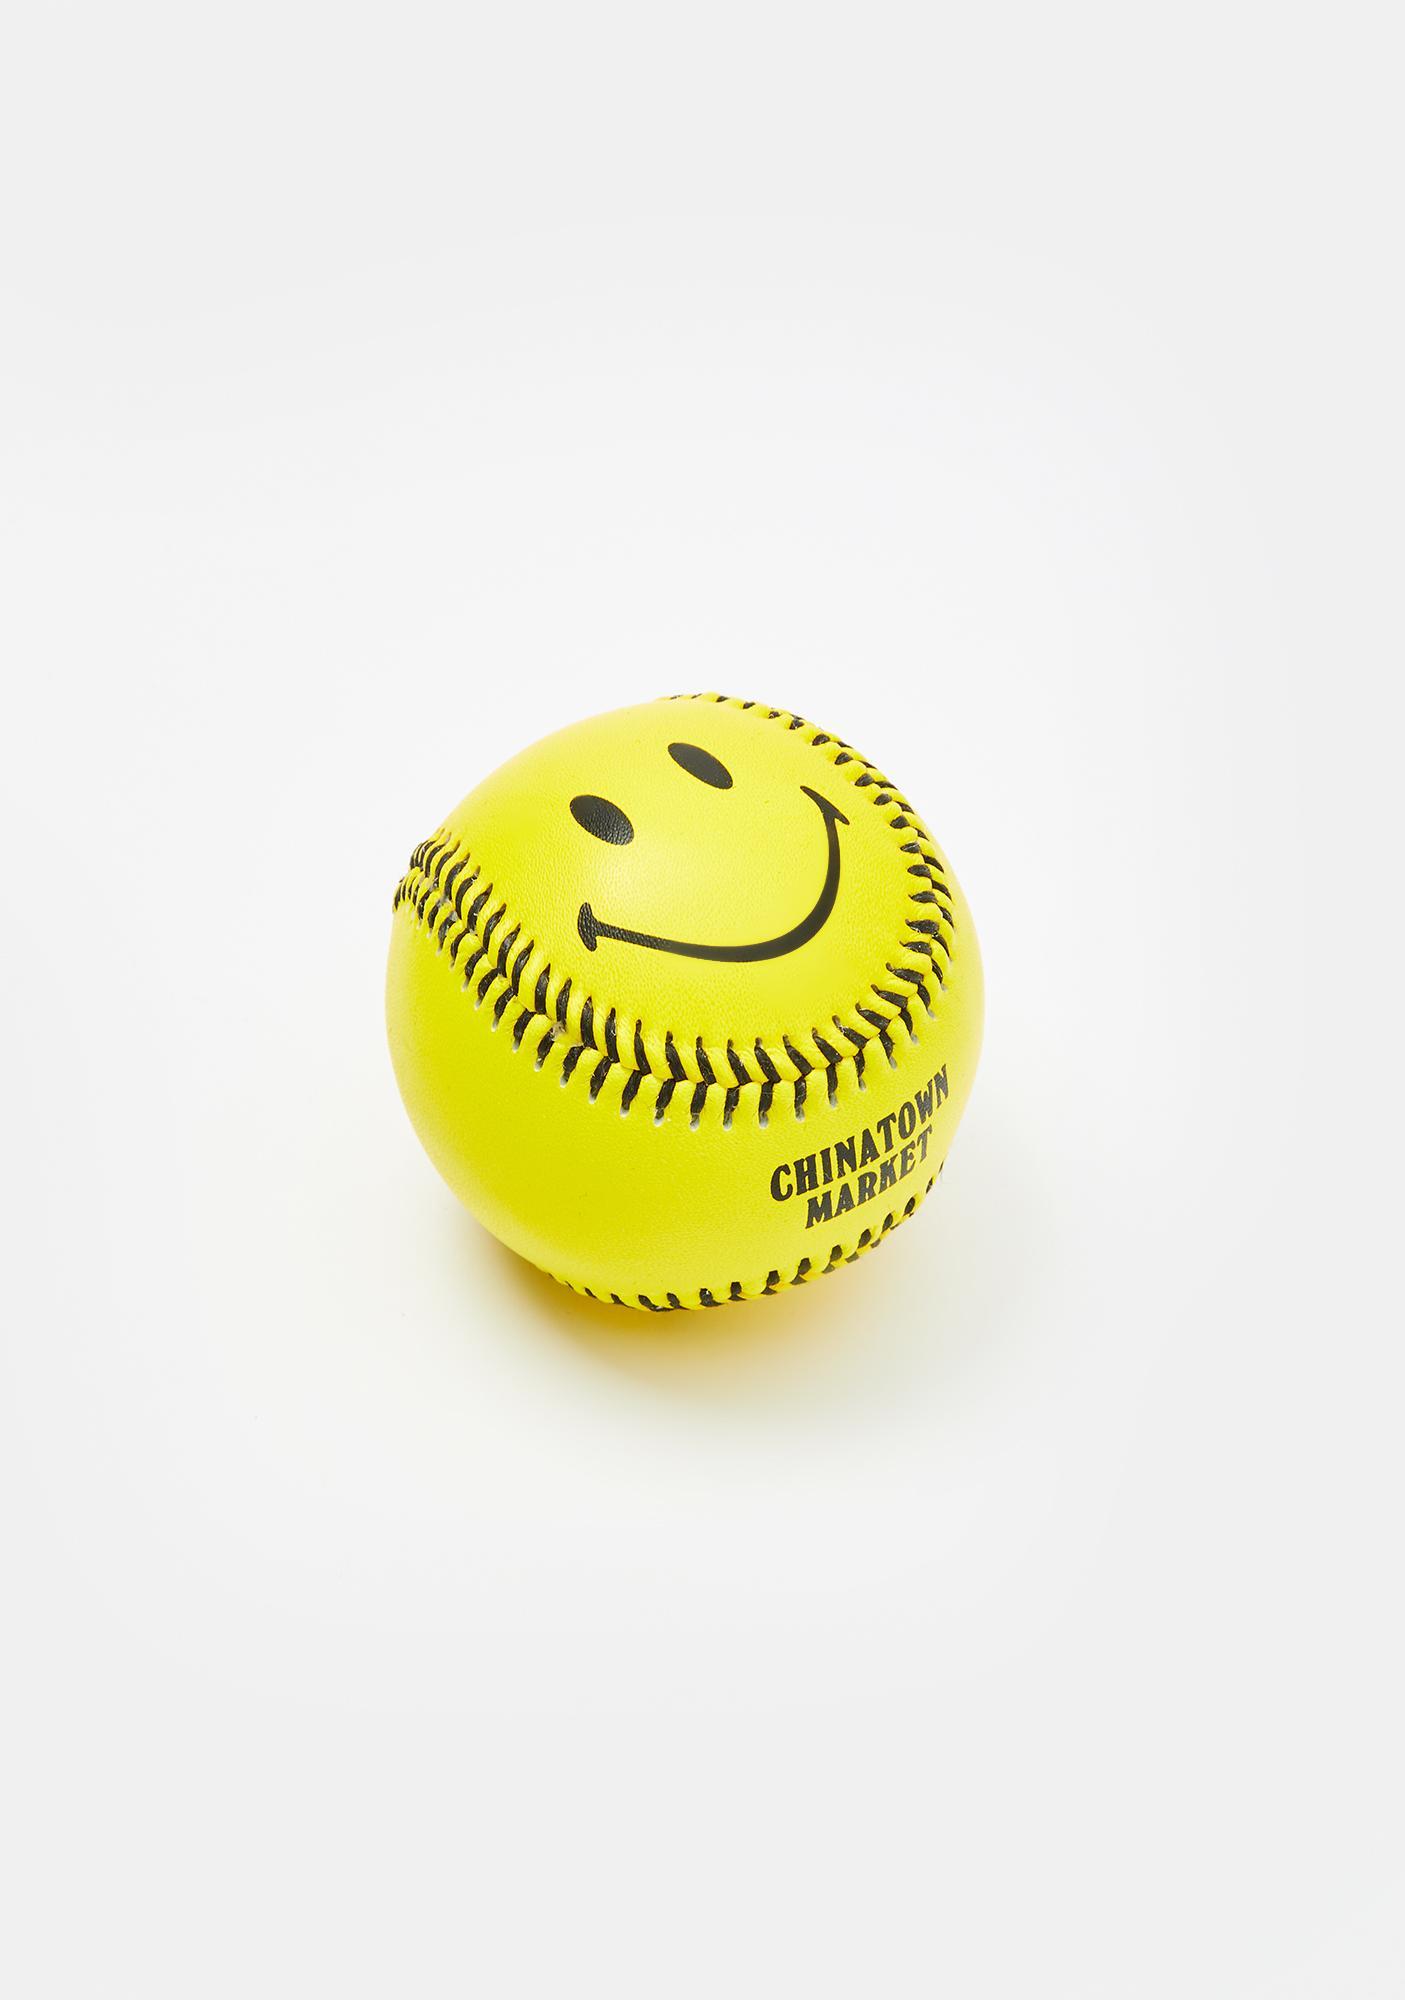 CHINATOWN MARKET Smiley Baseball